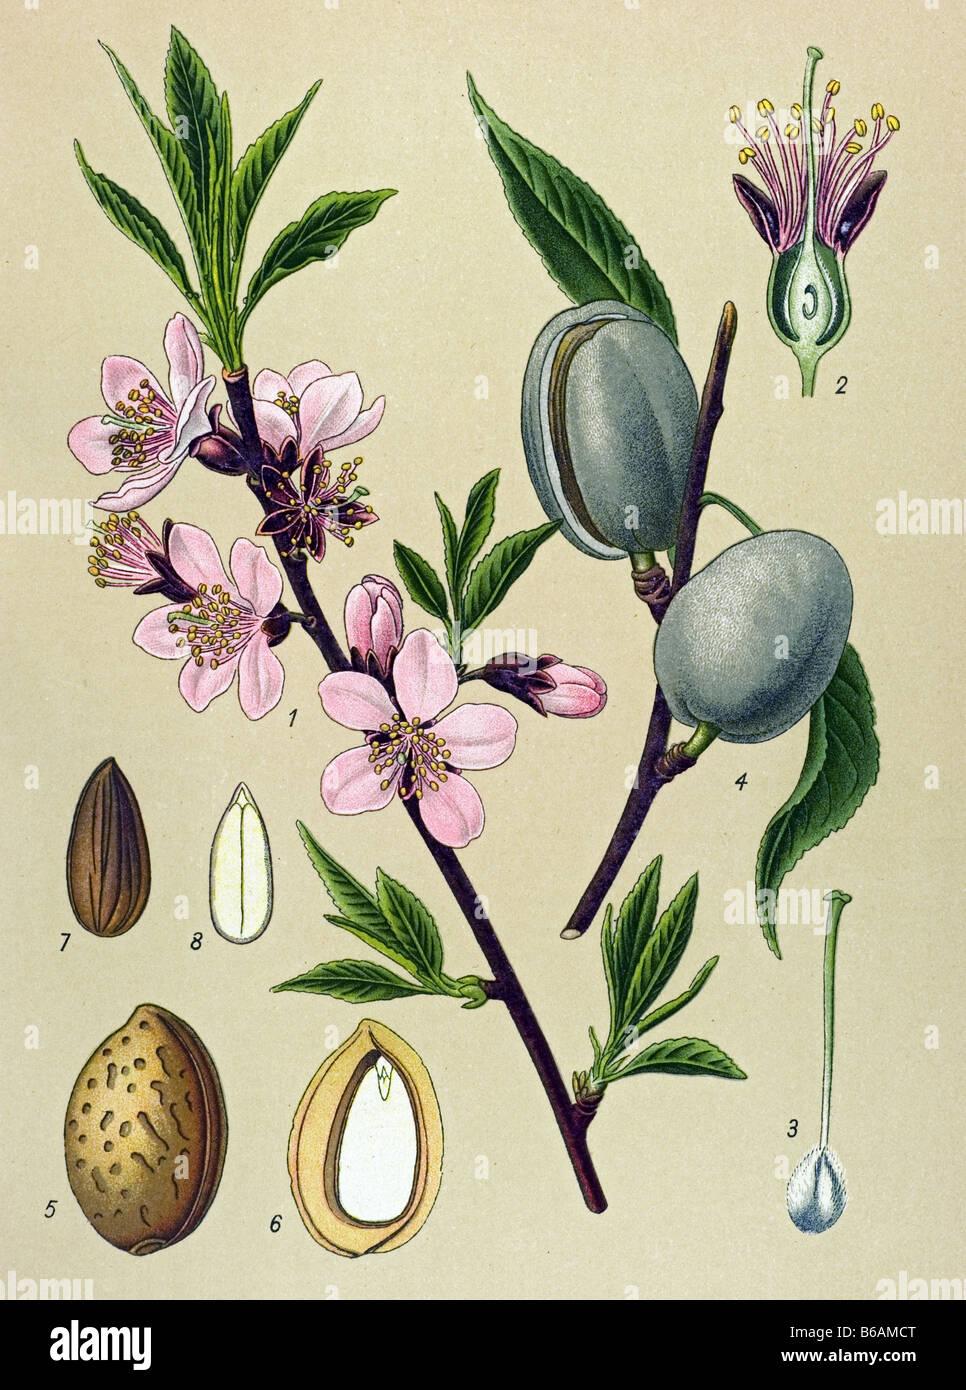 Botanical Illustration of the Almond